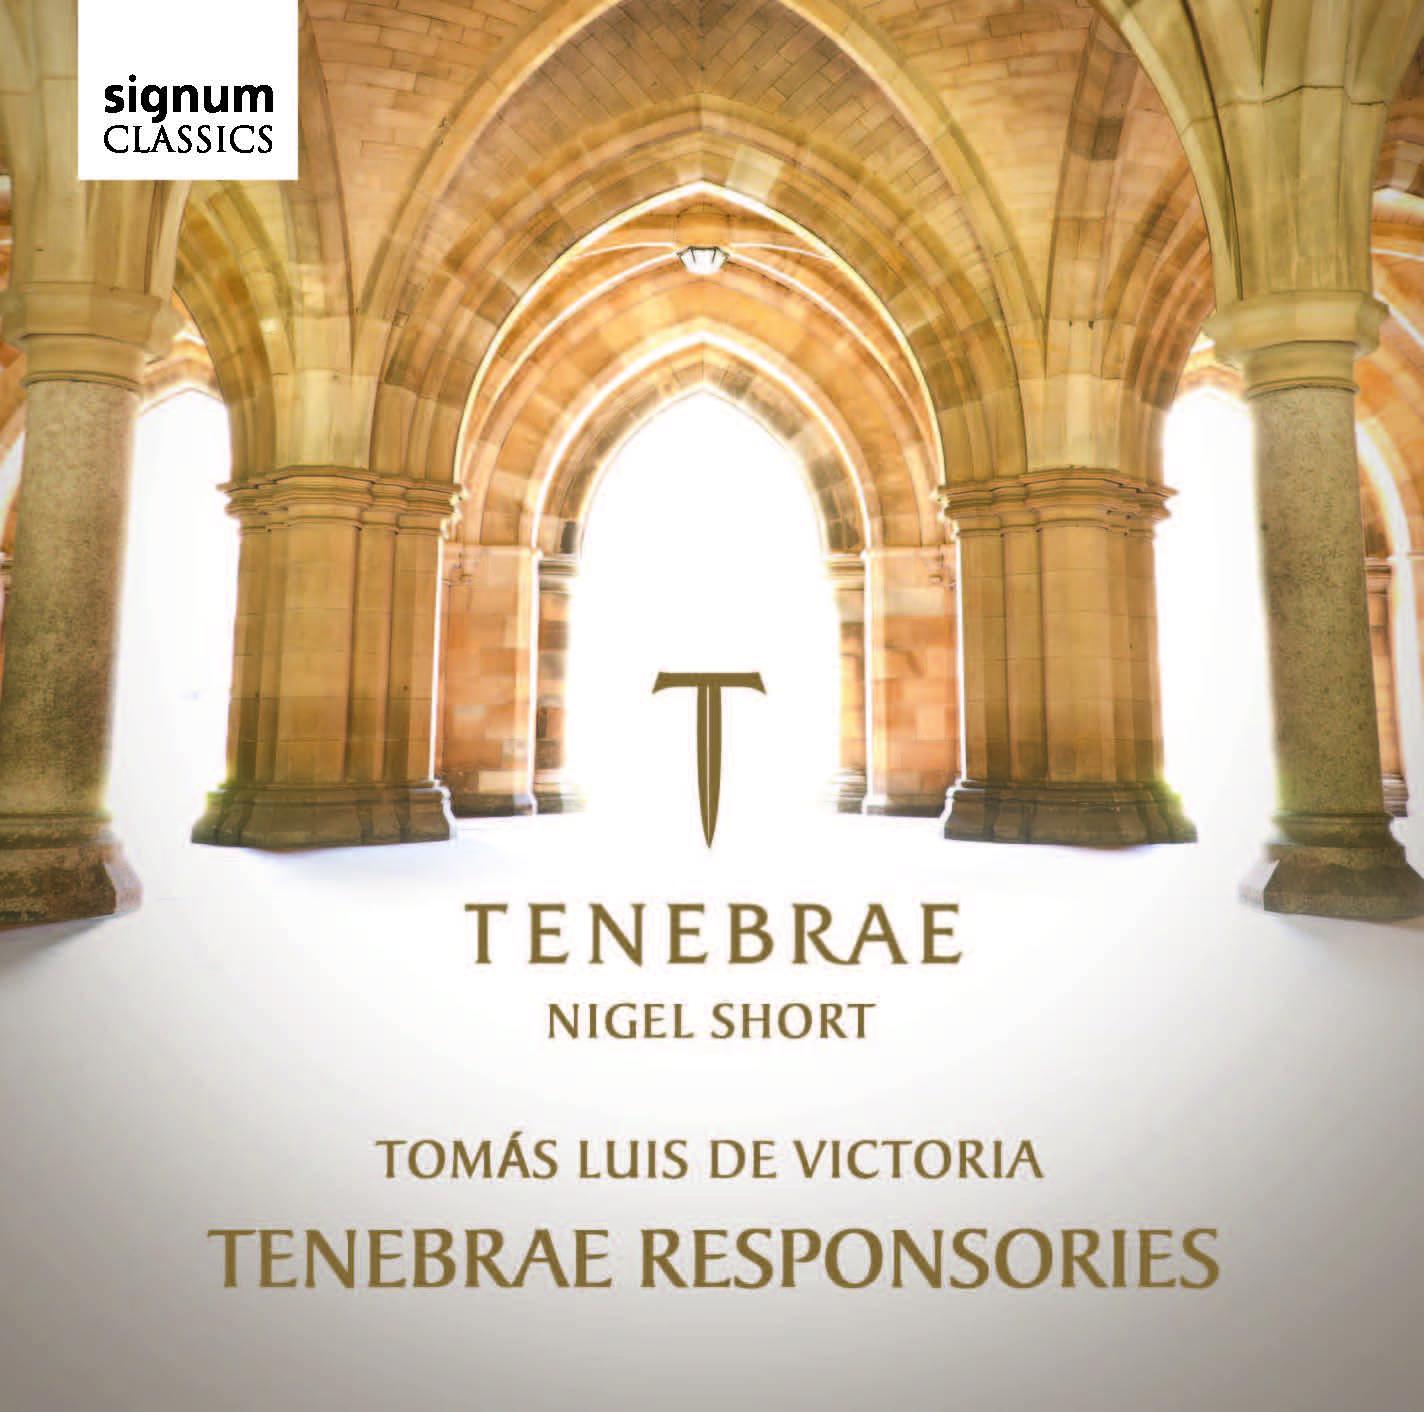 Victoria Tenebrae Responsories